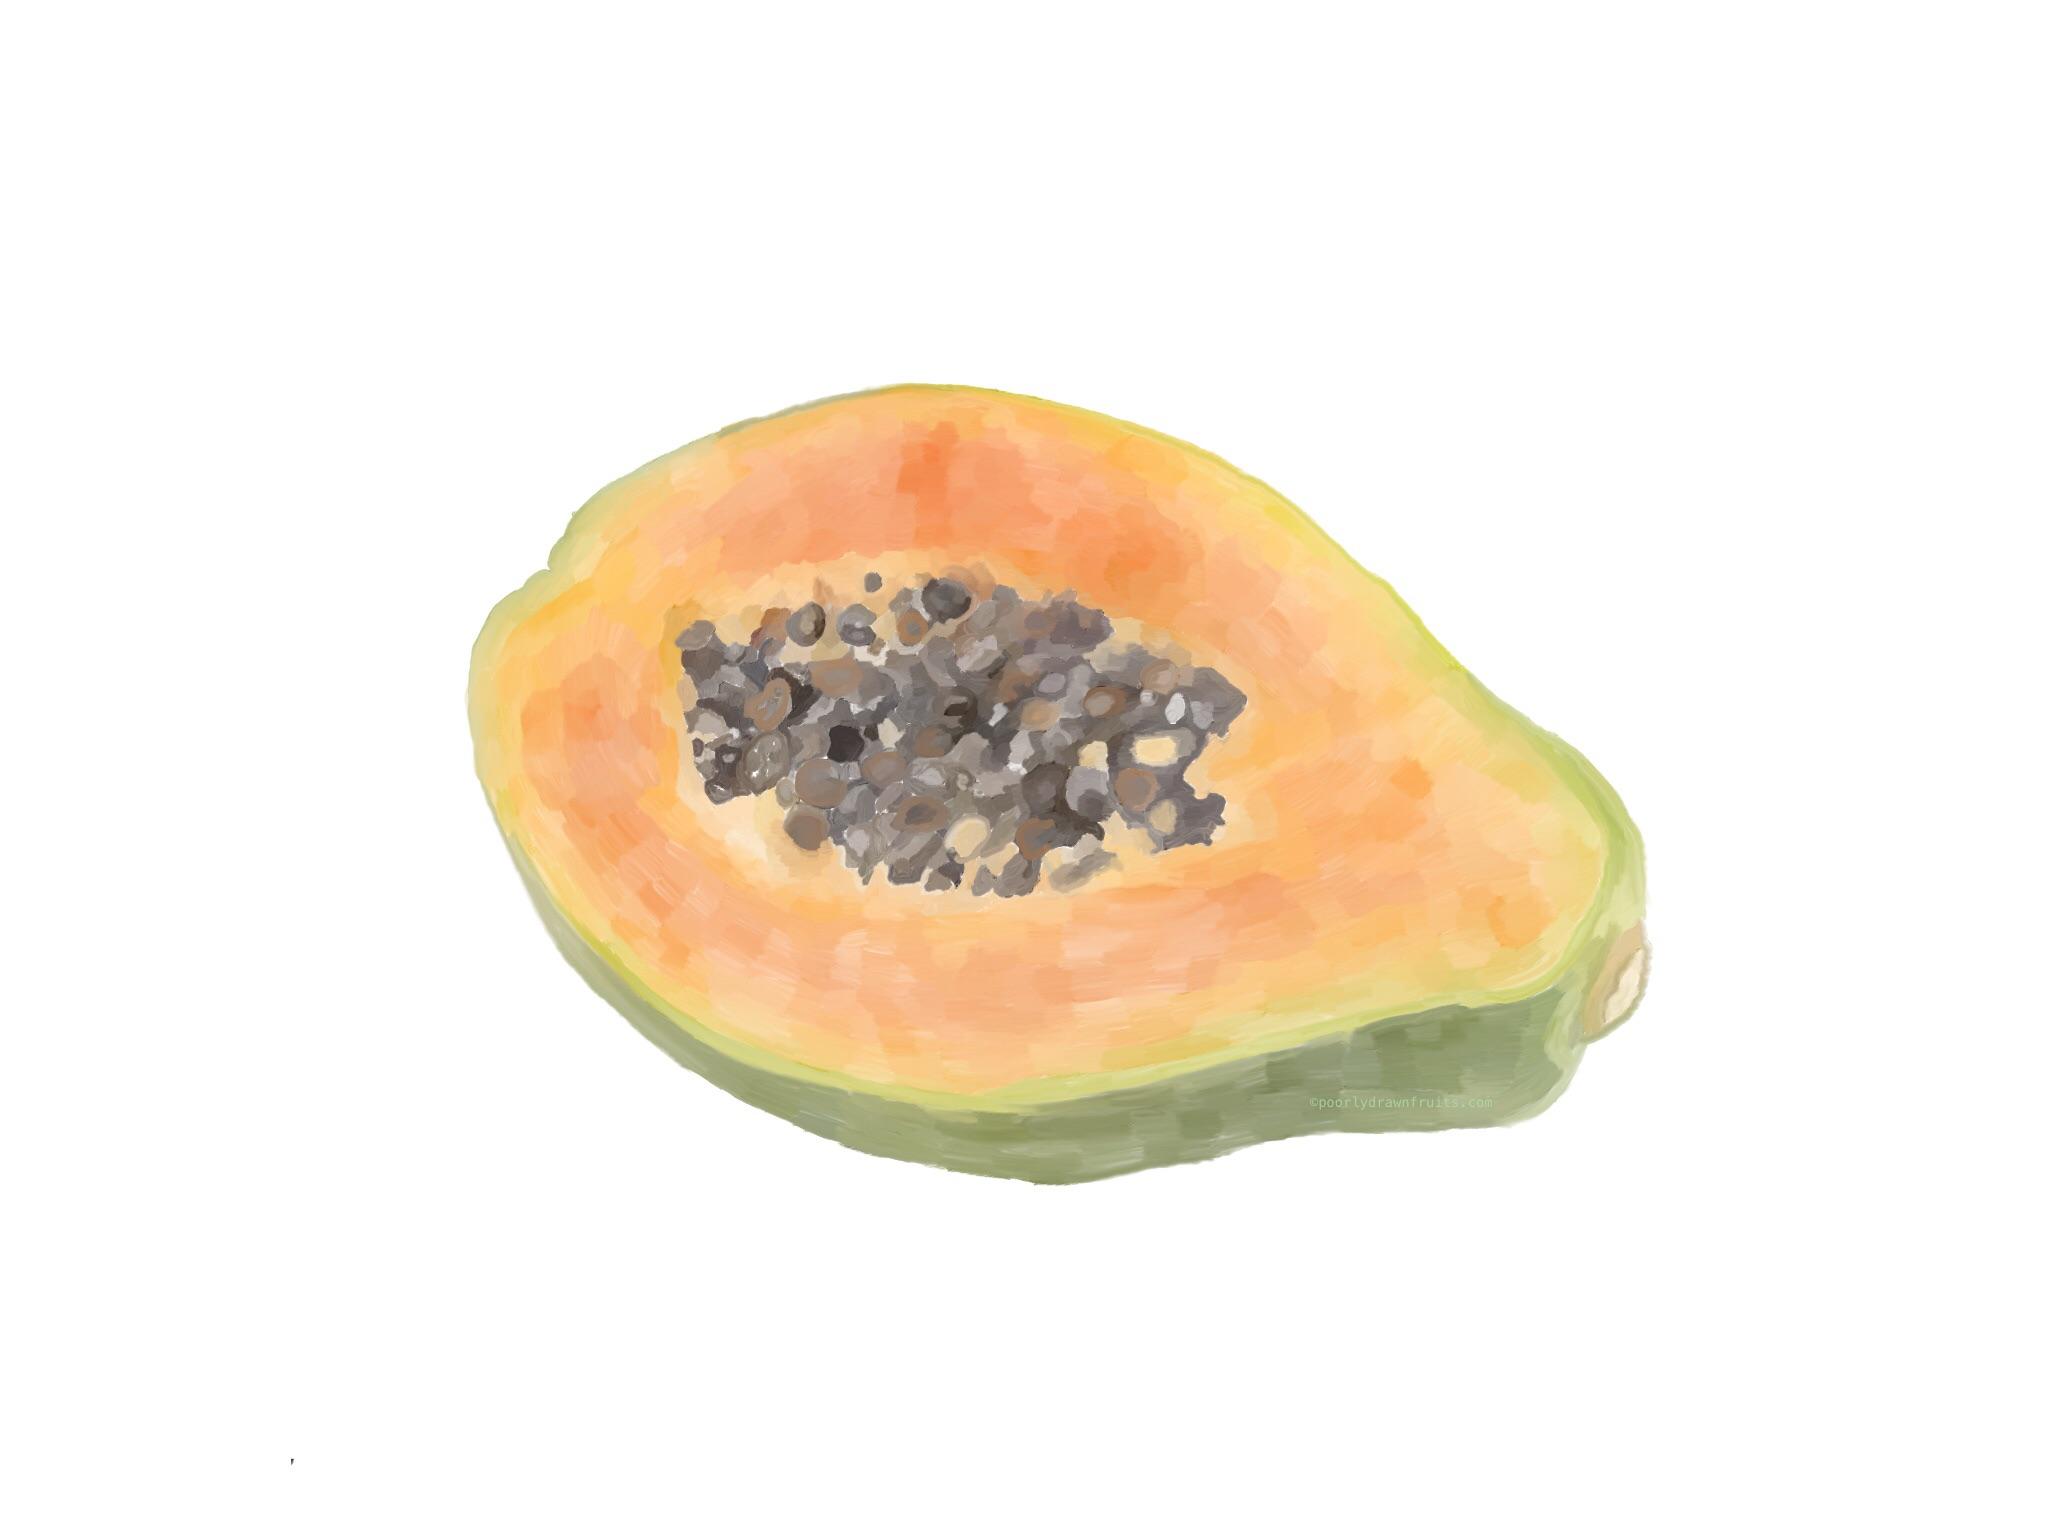 papaya - drawn - fruit - painting - tracing